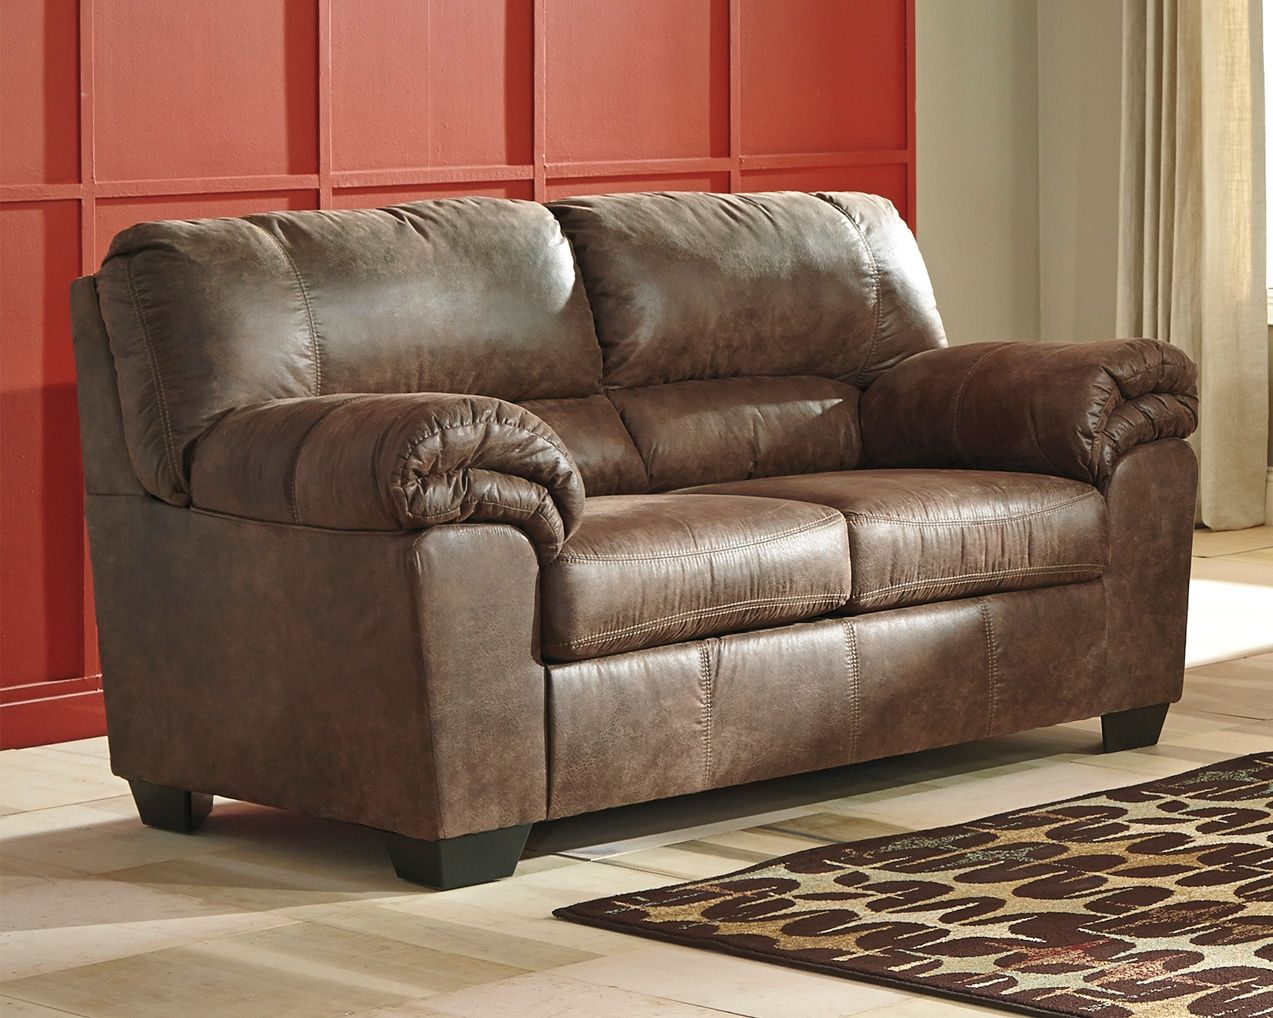 Bladen Loveseat Coffee In 2020 Leather Furniture Love Seat Furniture